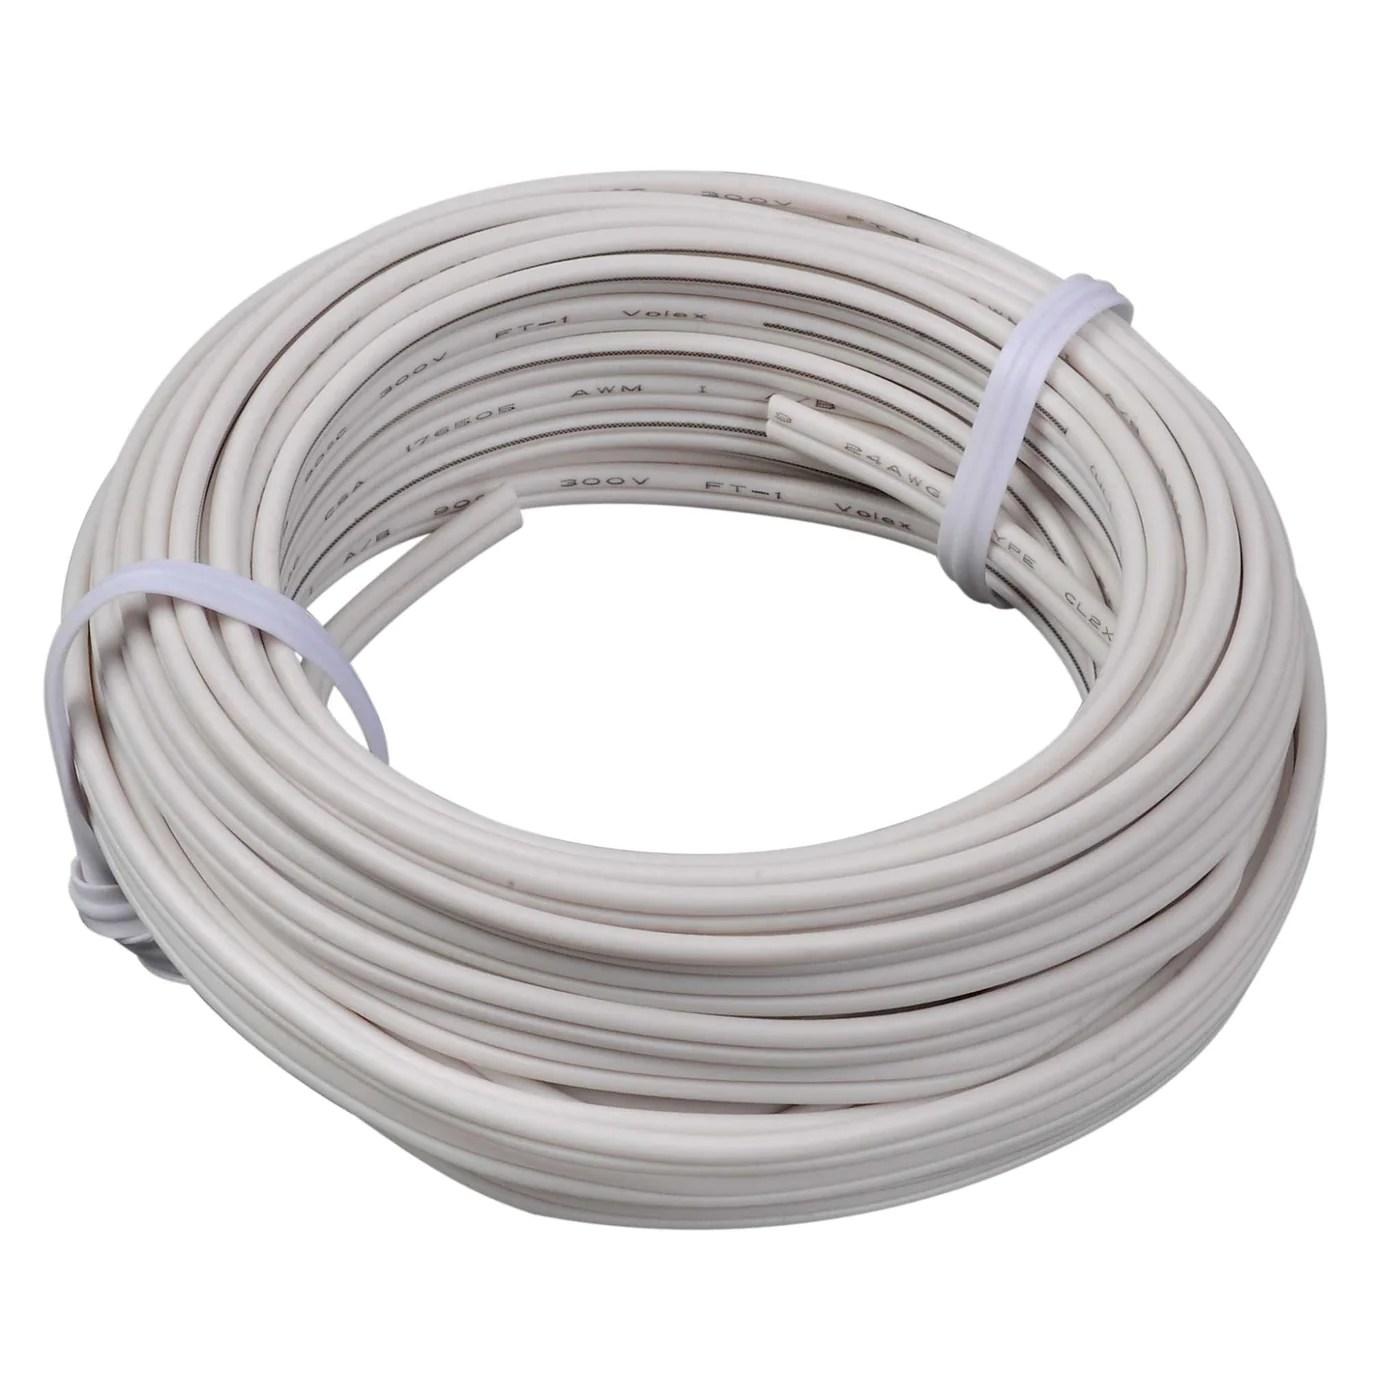 medium resolution of  garage door opener wire service parts the genie company